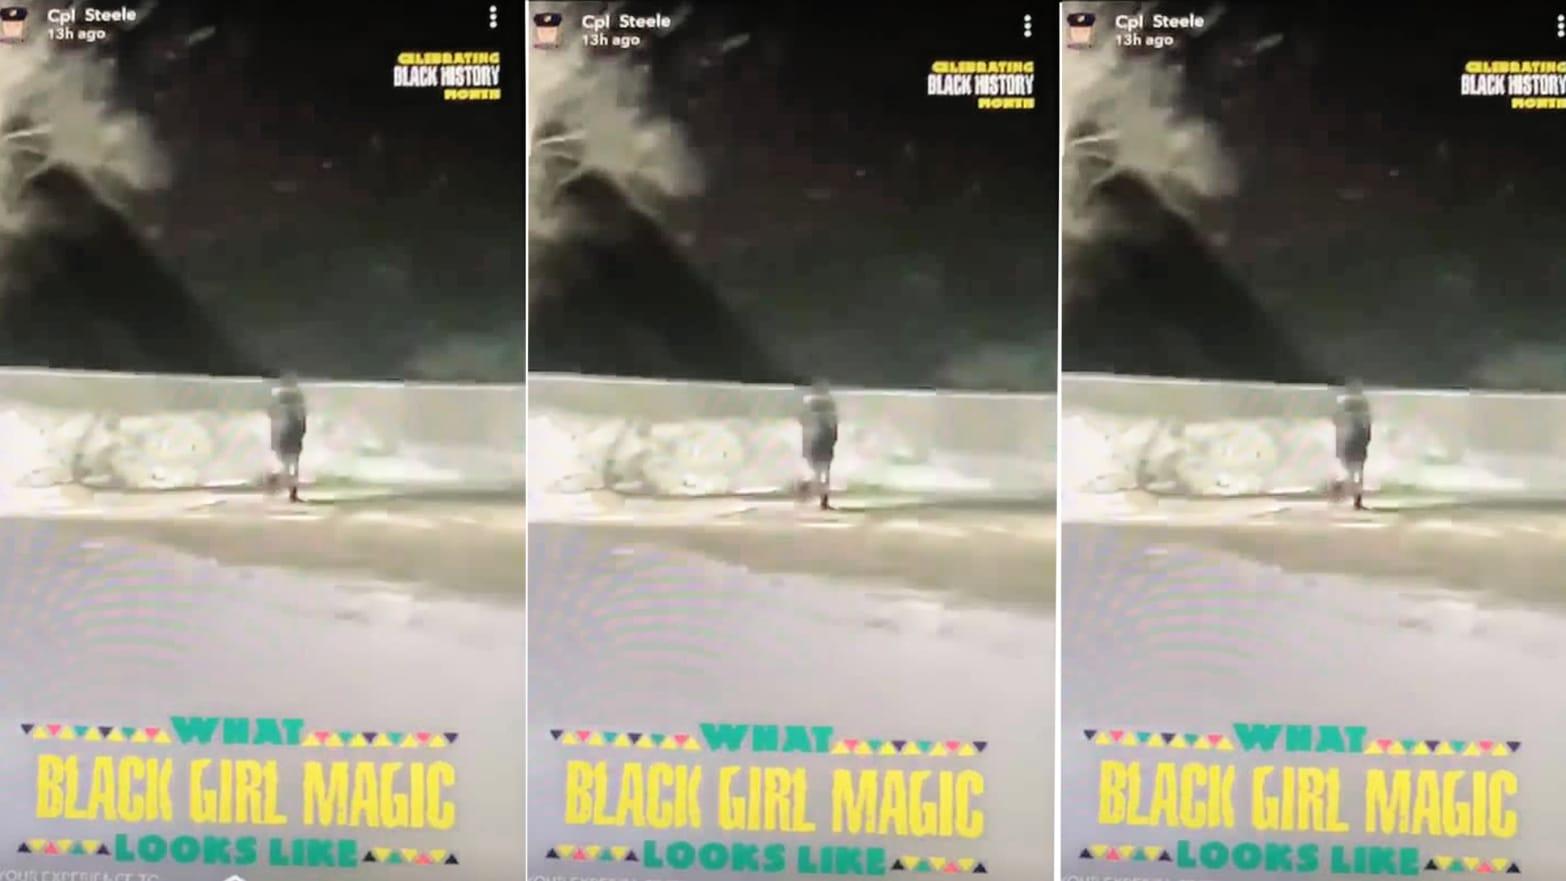 White Officer Demoted for Posting 'Racist' Videos Mocking Black